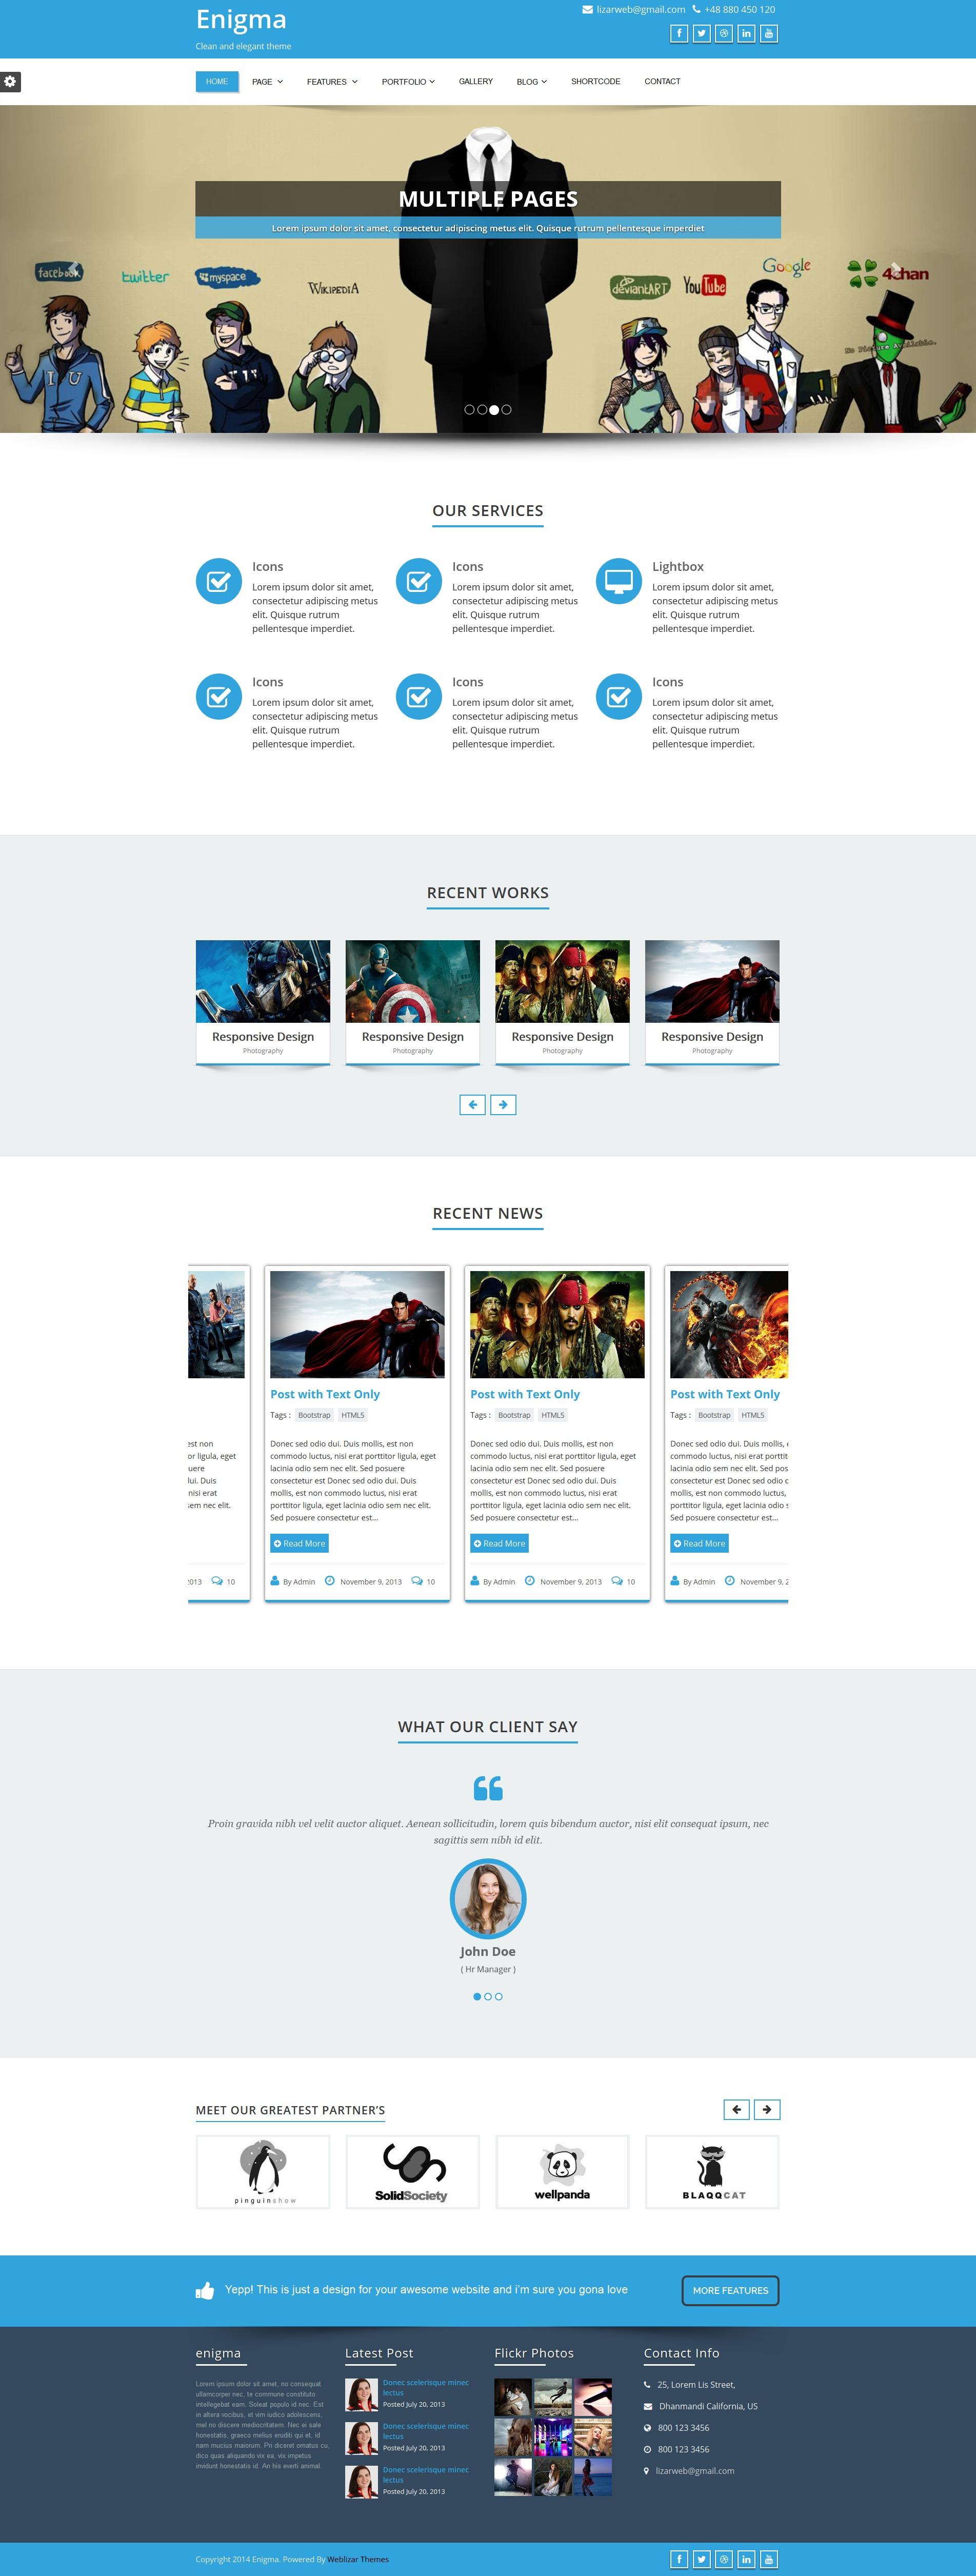 Enigma-Premium-Advance company WordPress theme